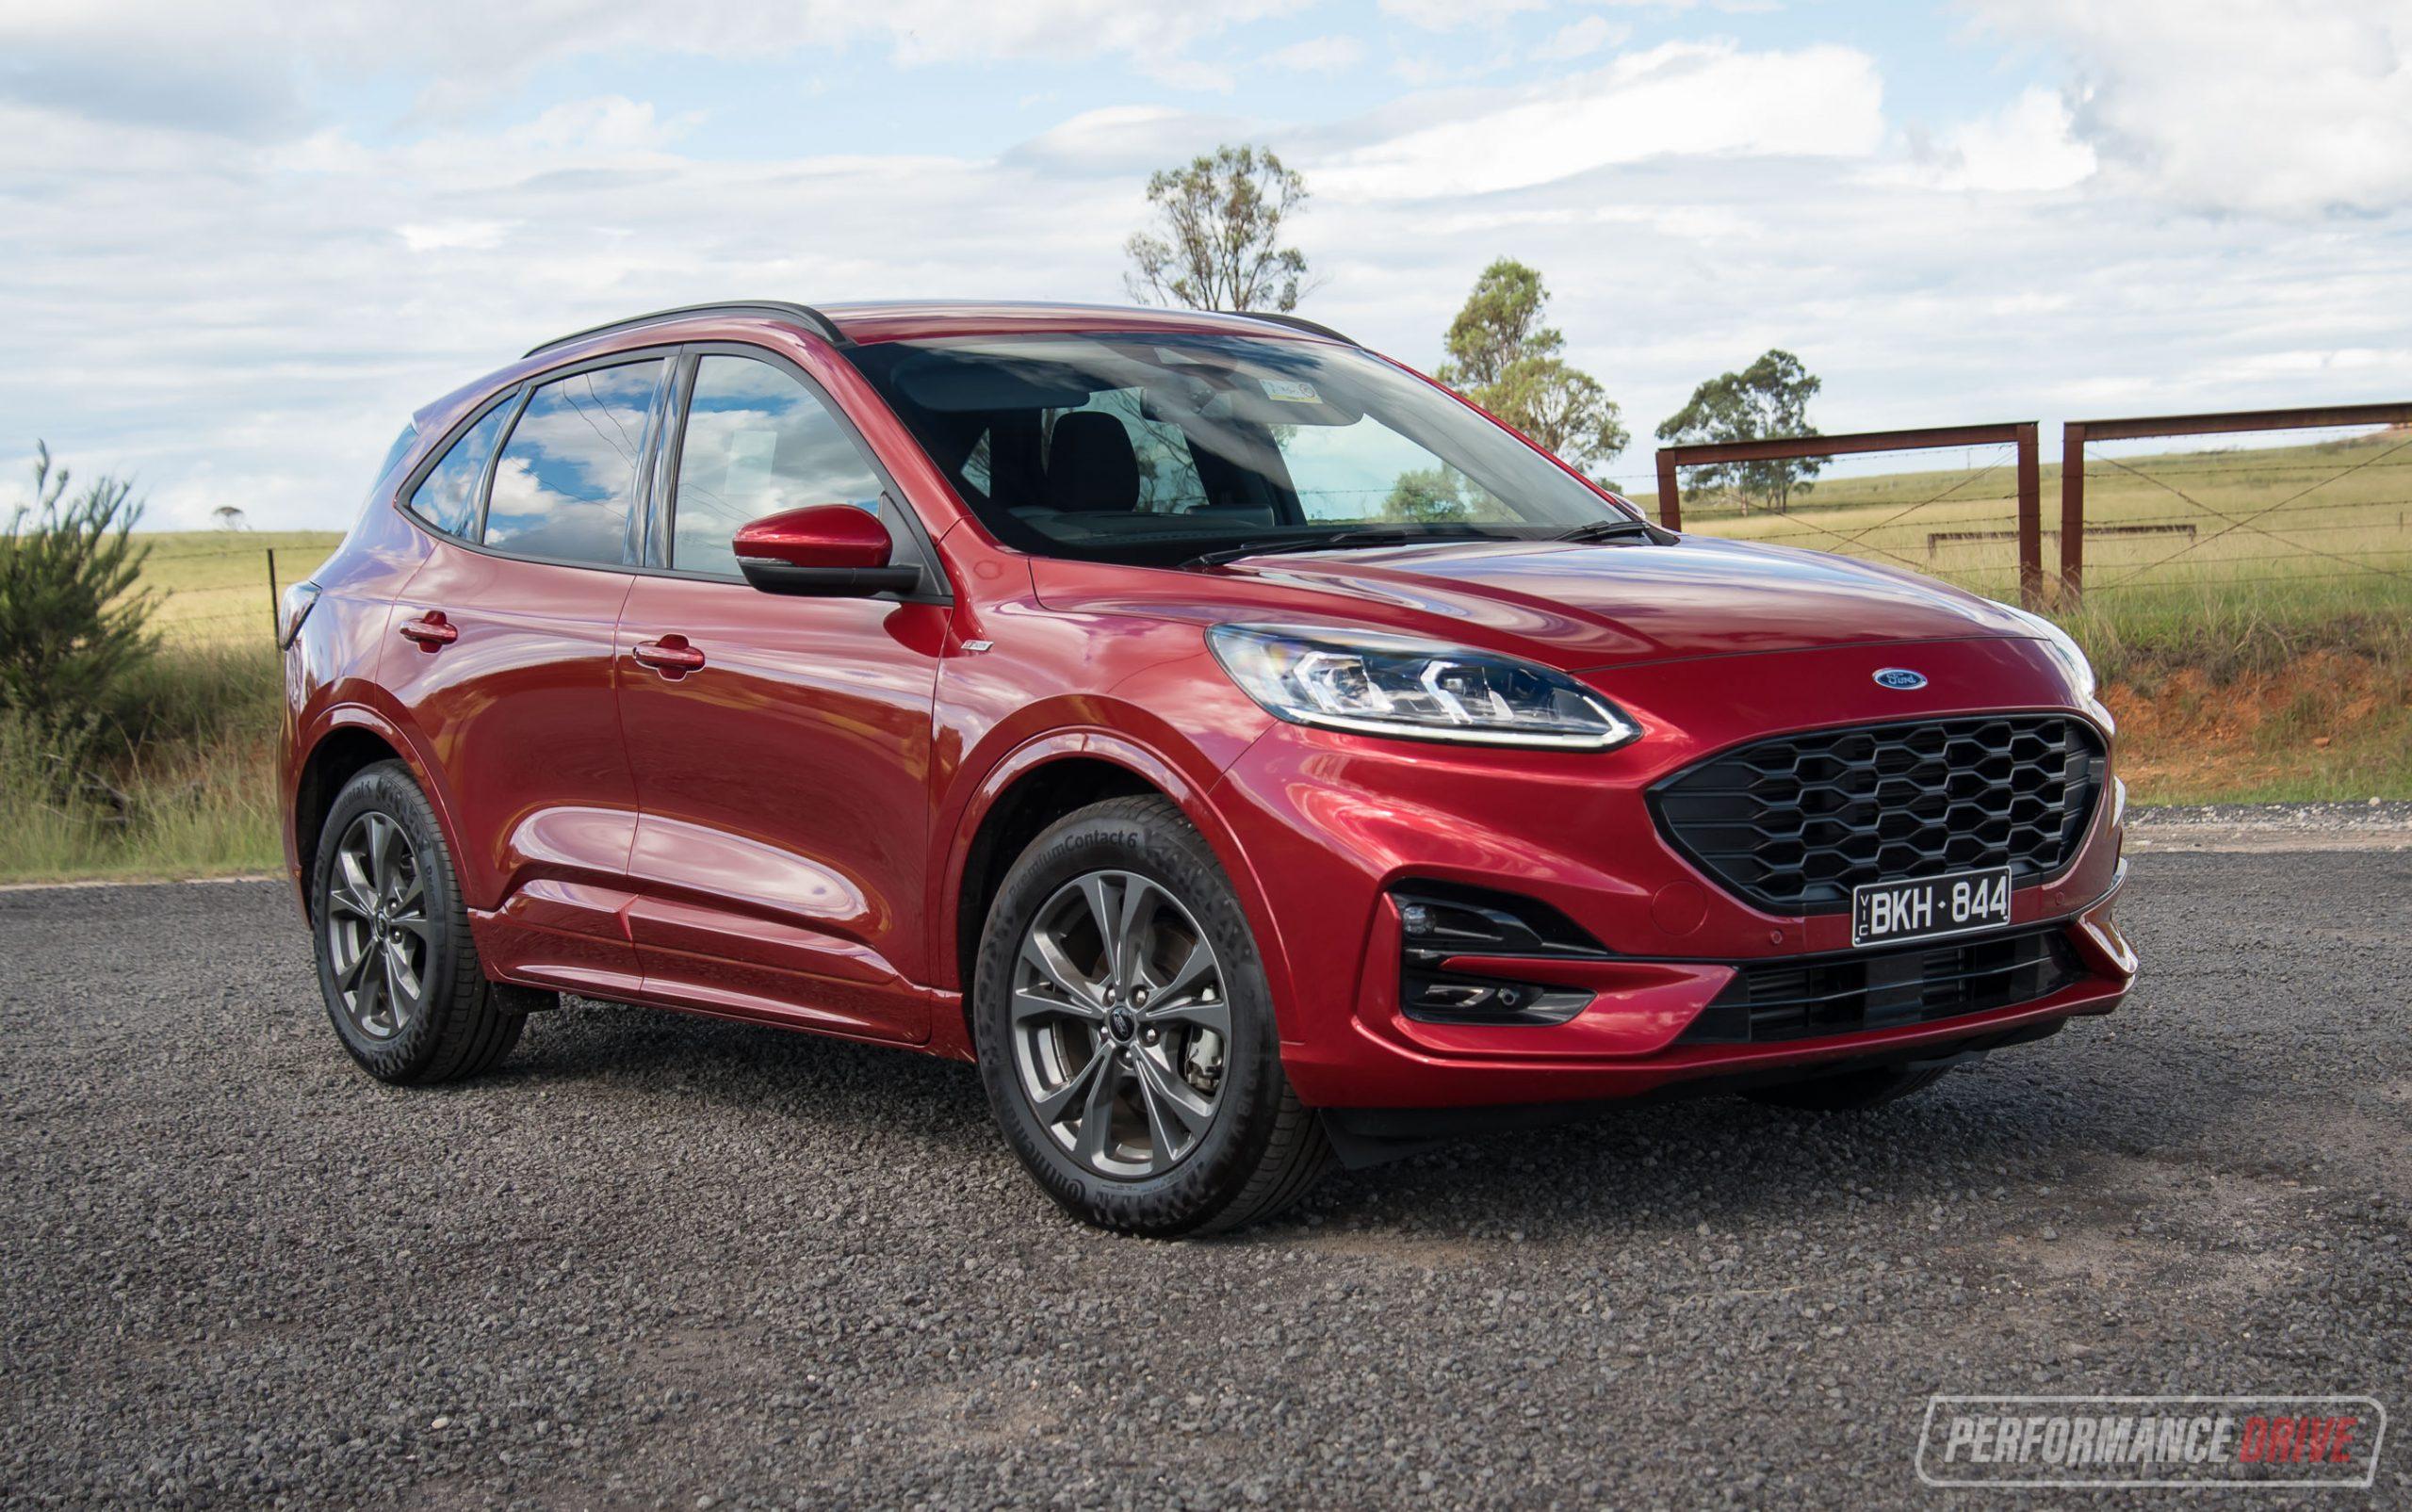 2021 Ford Escape ST-Line review (video)